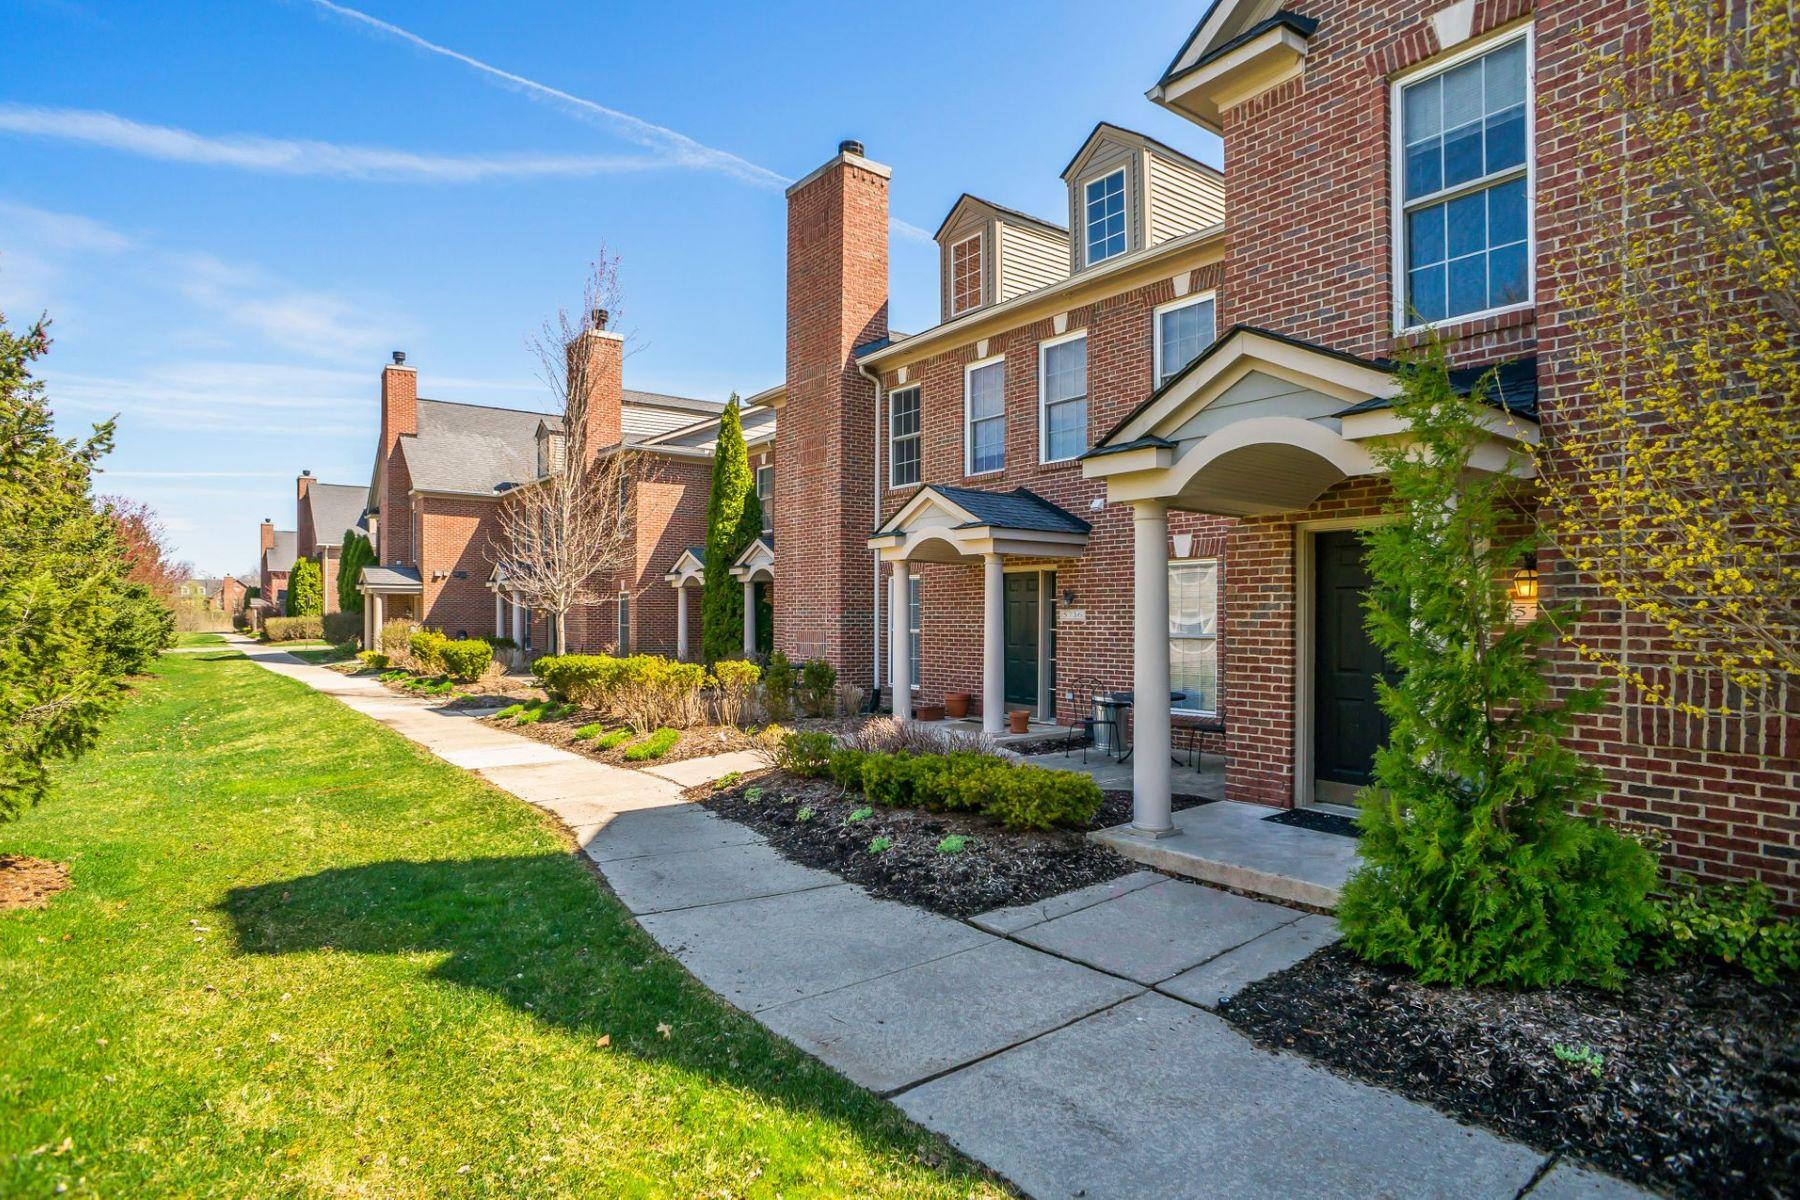 Condominiums for Sale at Pittsfield 5738 Hampshire Lane Ypsilanti, Michigan 48197 United States